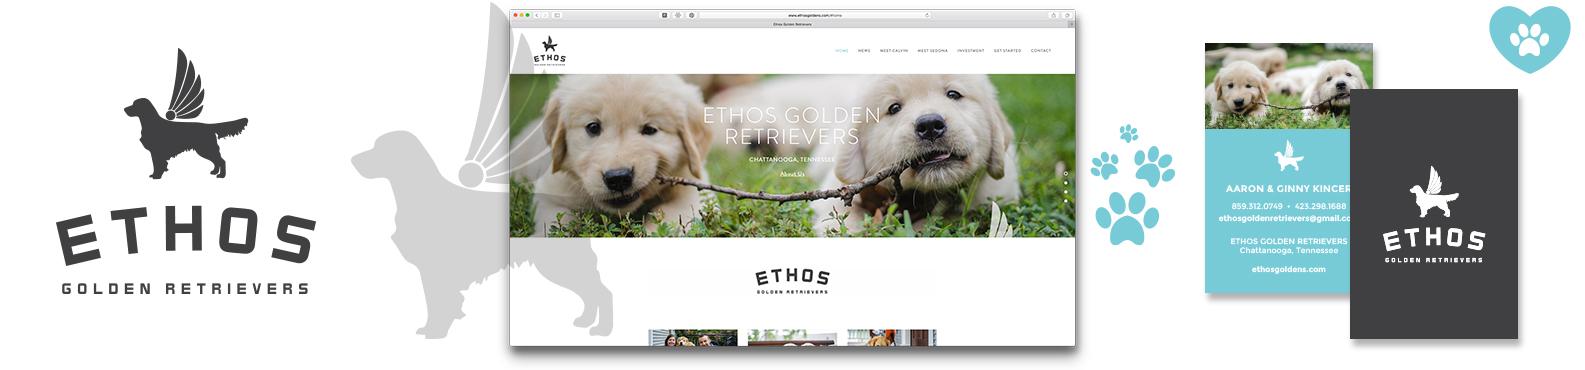 ETHOS Golden Retrievers   Logo Brand Identity Photography Website